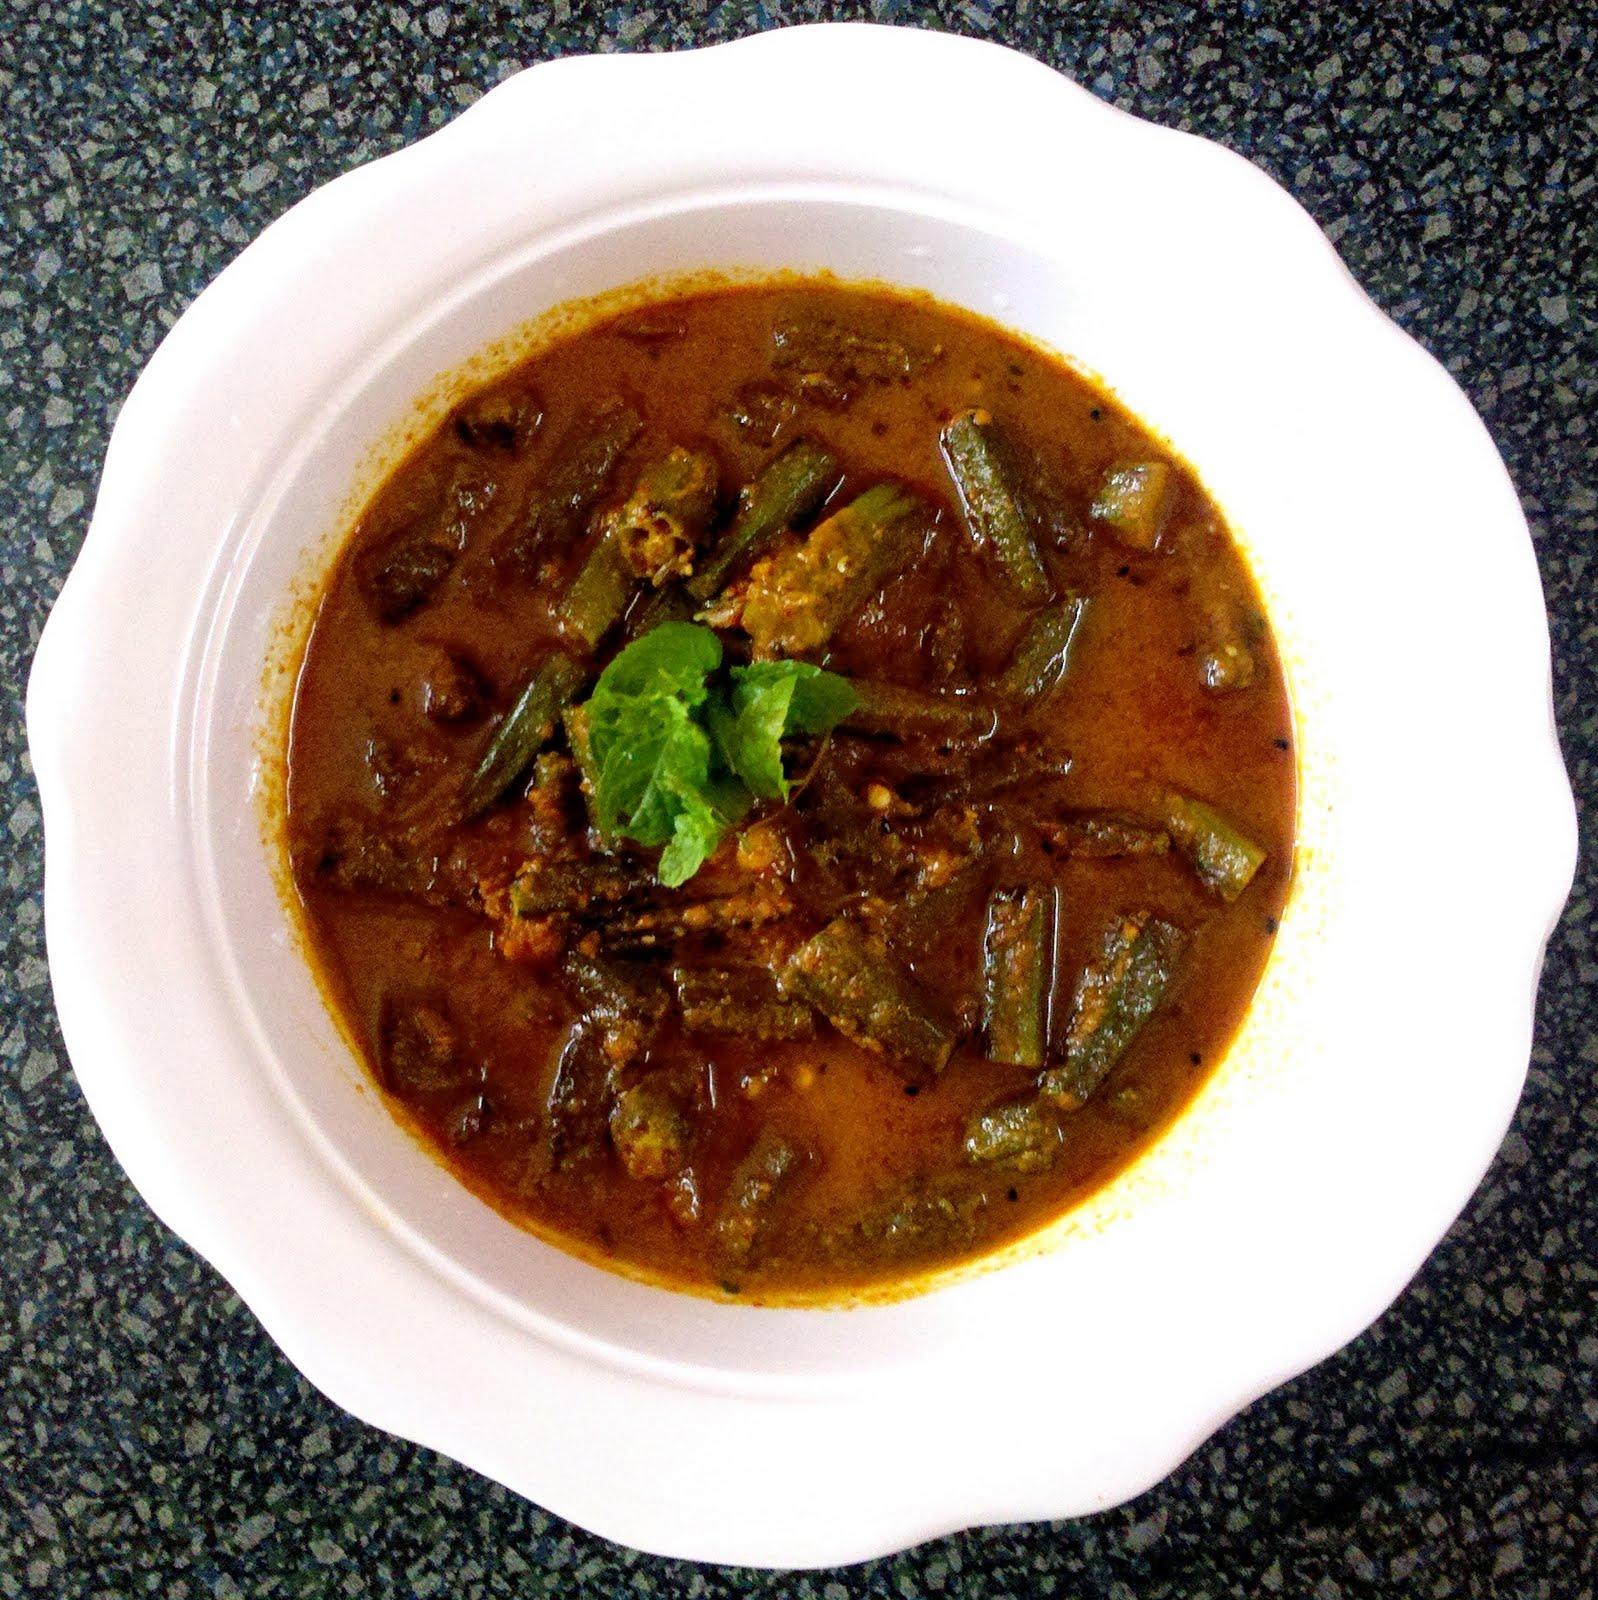 Kitchen Impossible 31 07: Usha Desi Kitchen: मसालेदार भिन्डी की सब्जी